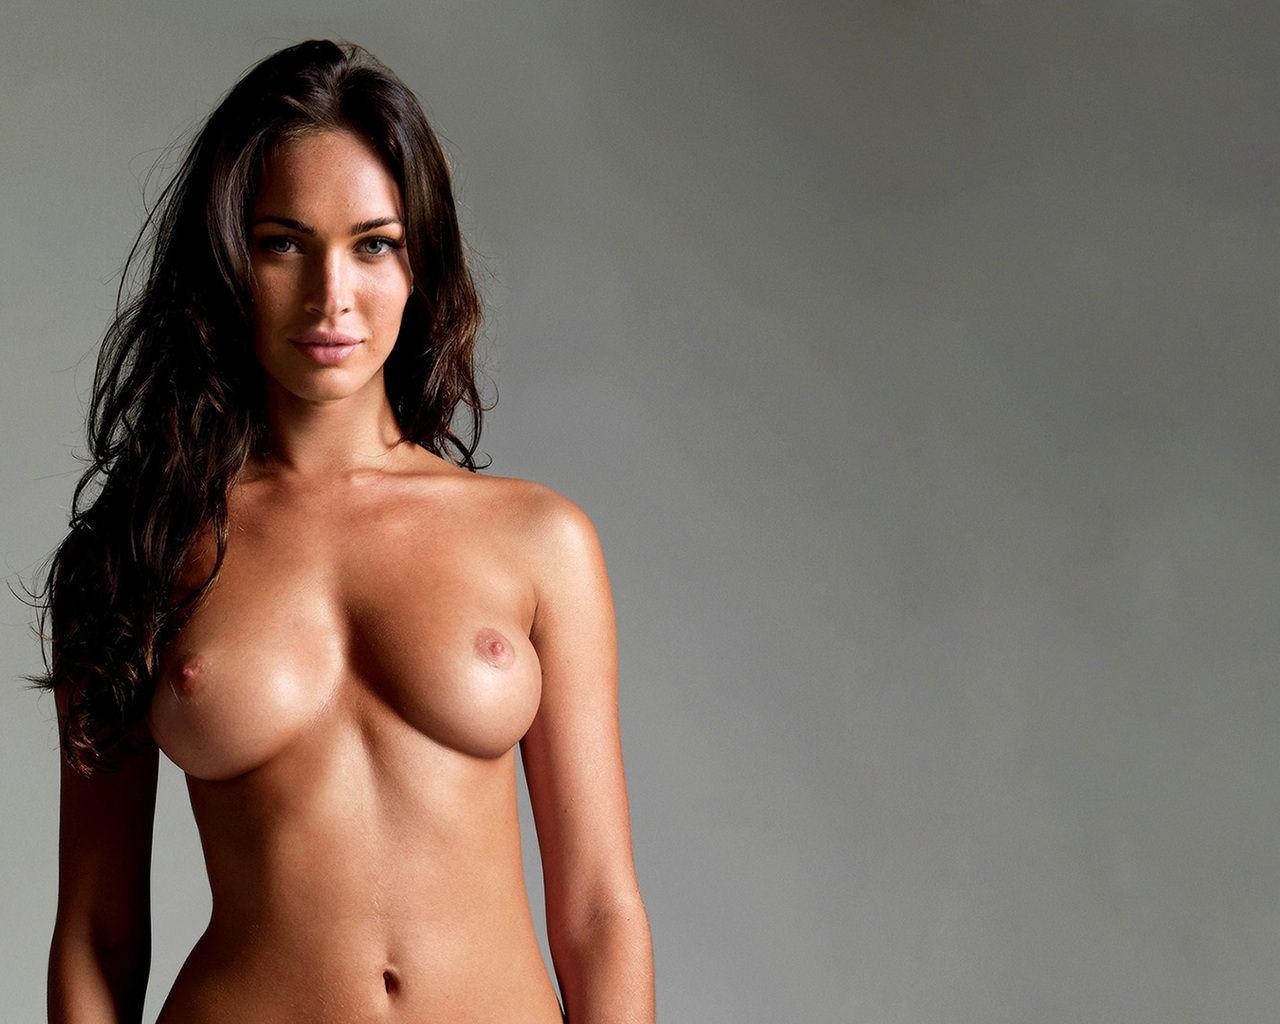 Jennifer lawrence denounces nude photos hack as sex crime